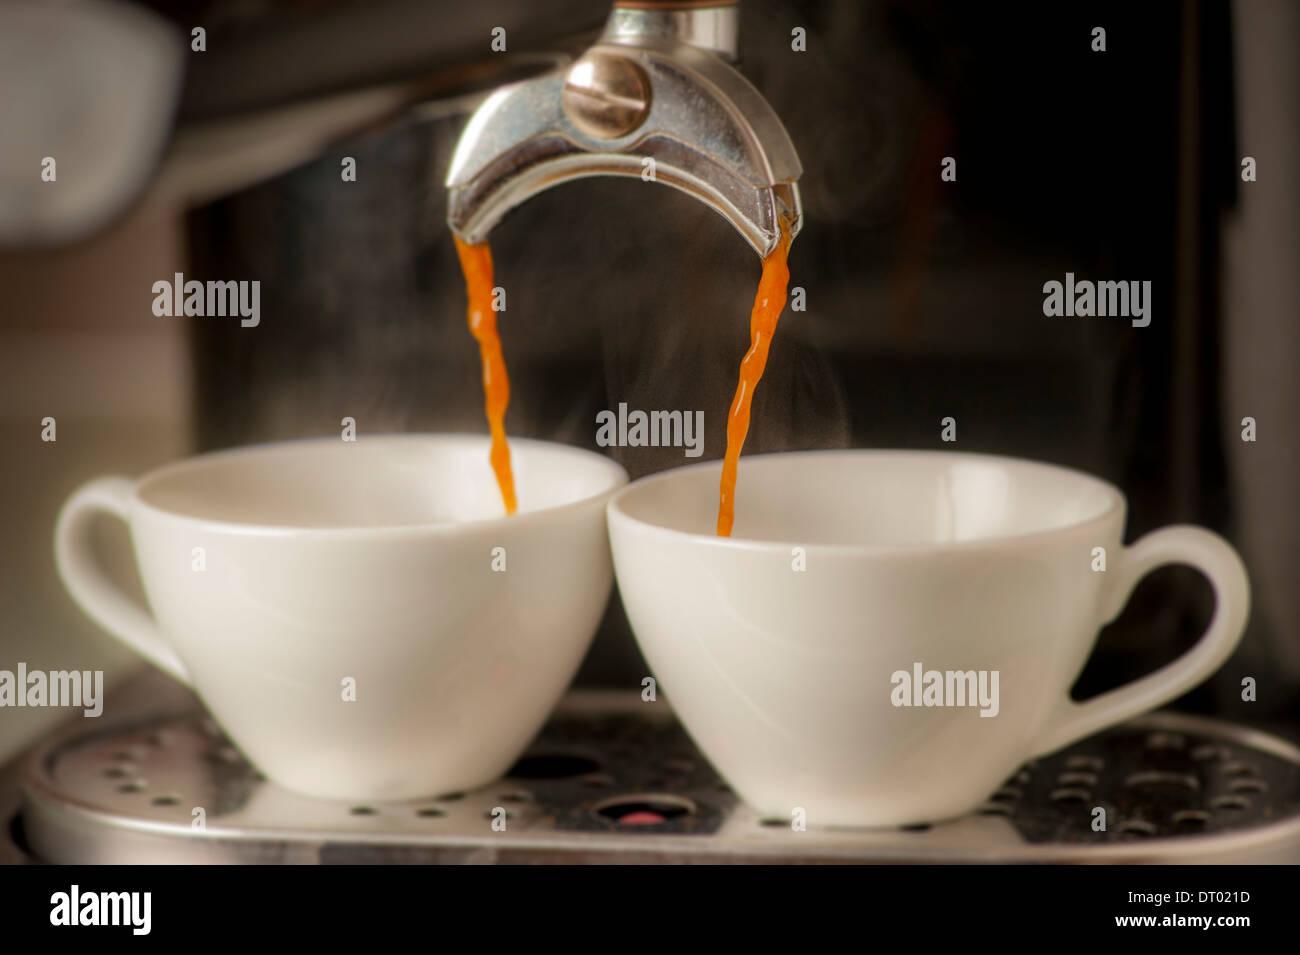 Espresso coffee machine dispensing into cups. - Stock Image